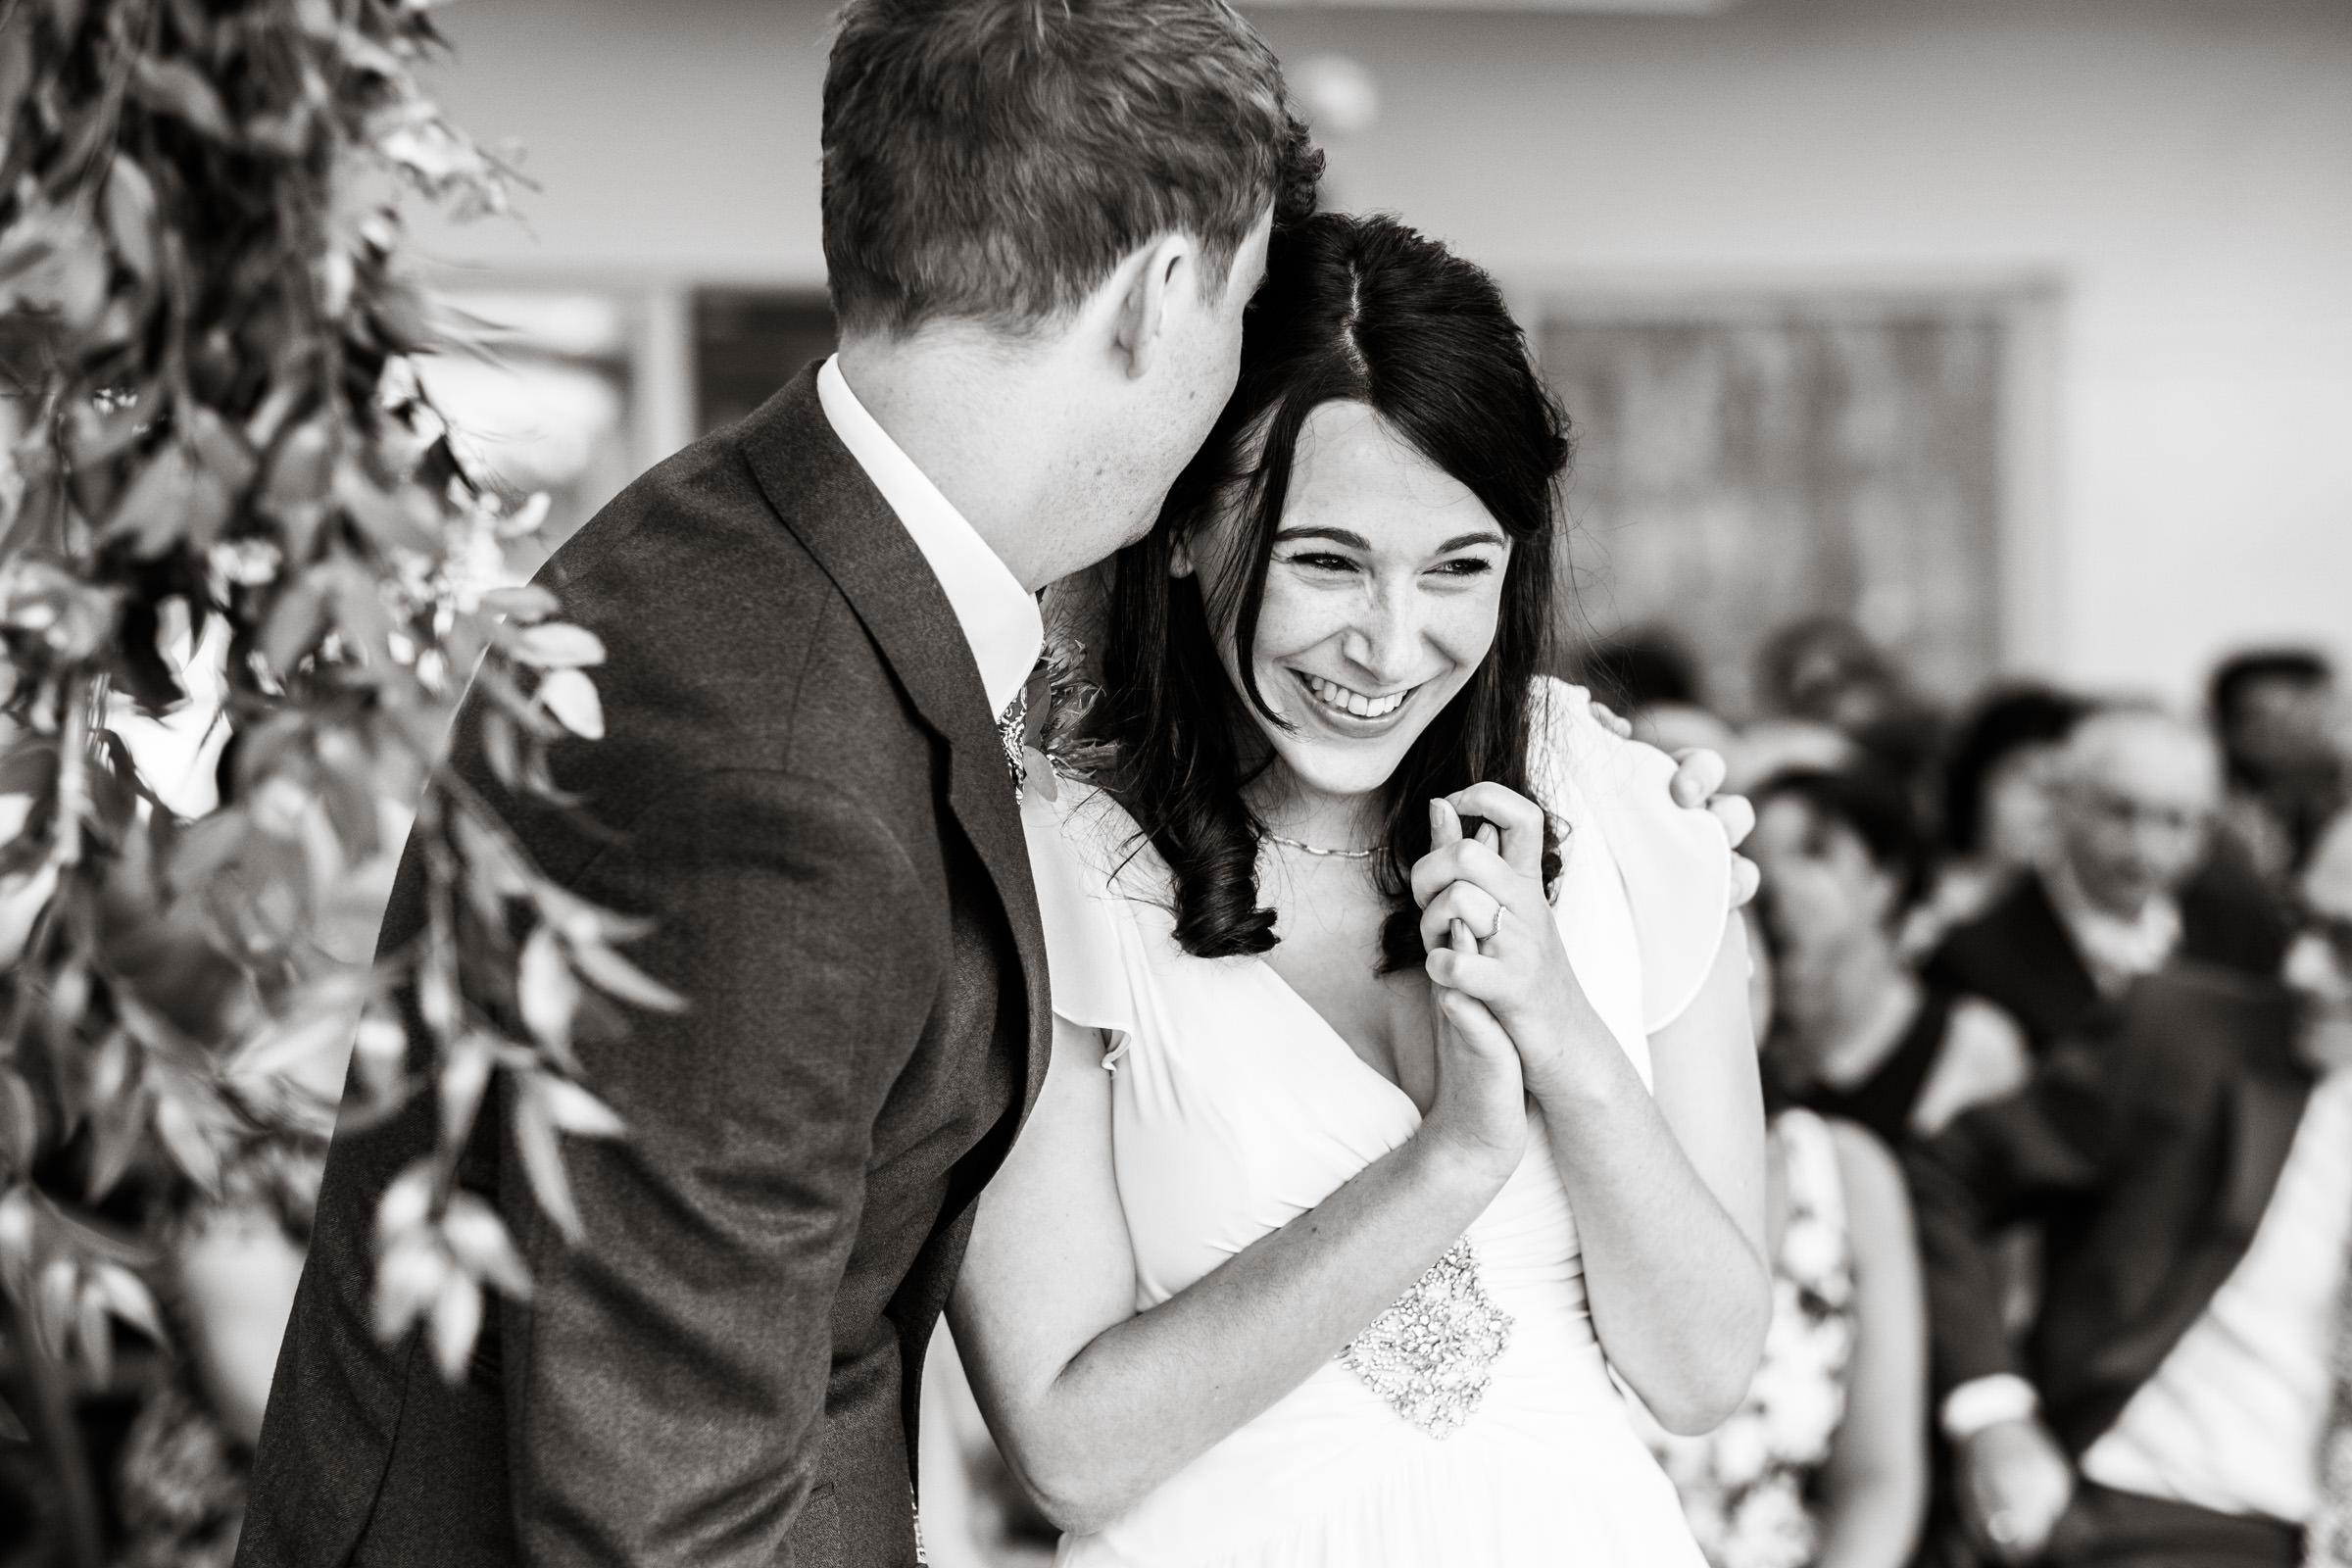 Wedding+Photography+At+The+Art+Pavilion+Mile+End+004.jpg